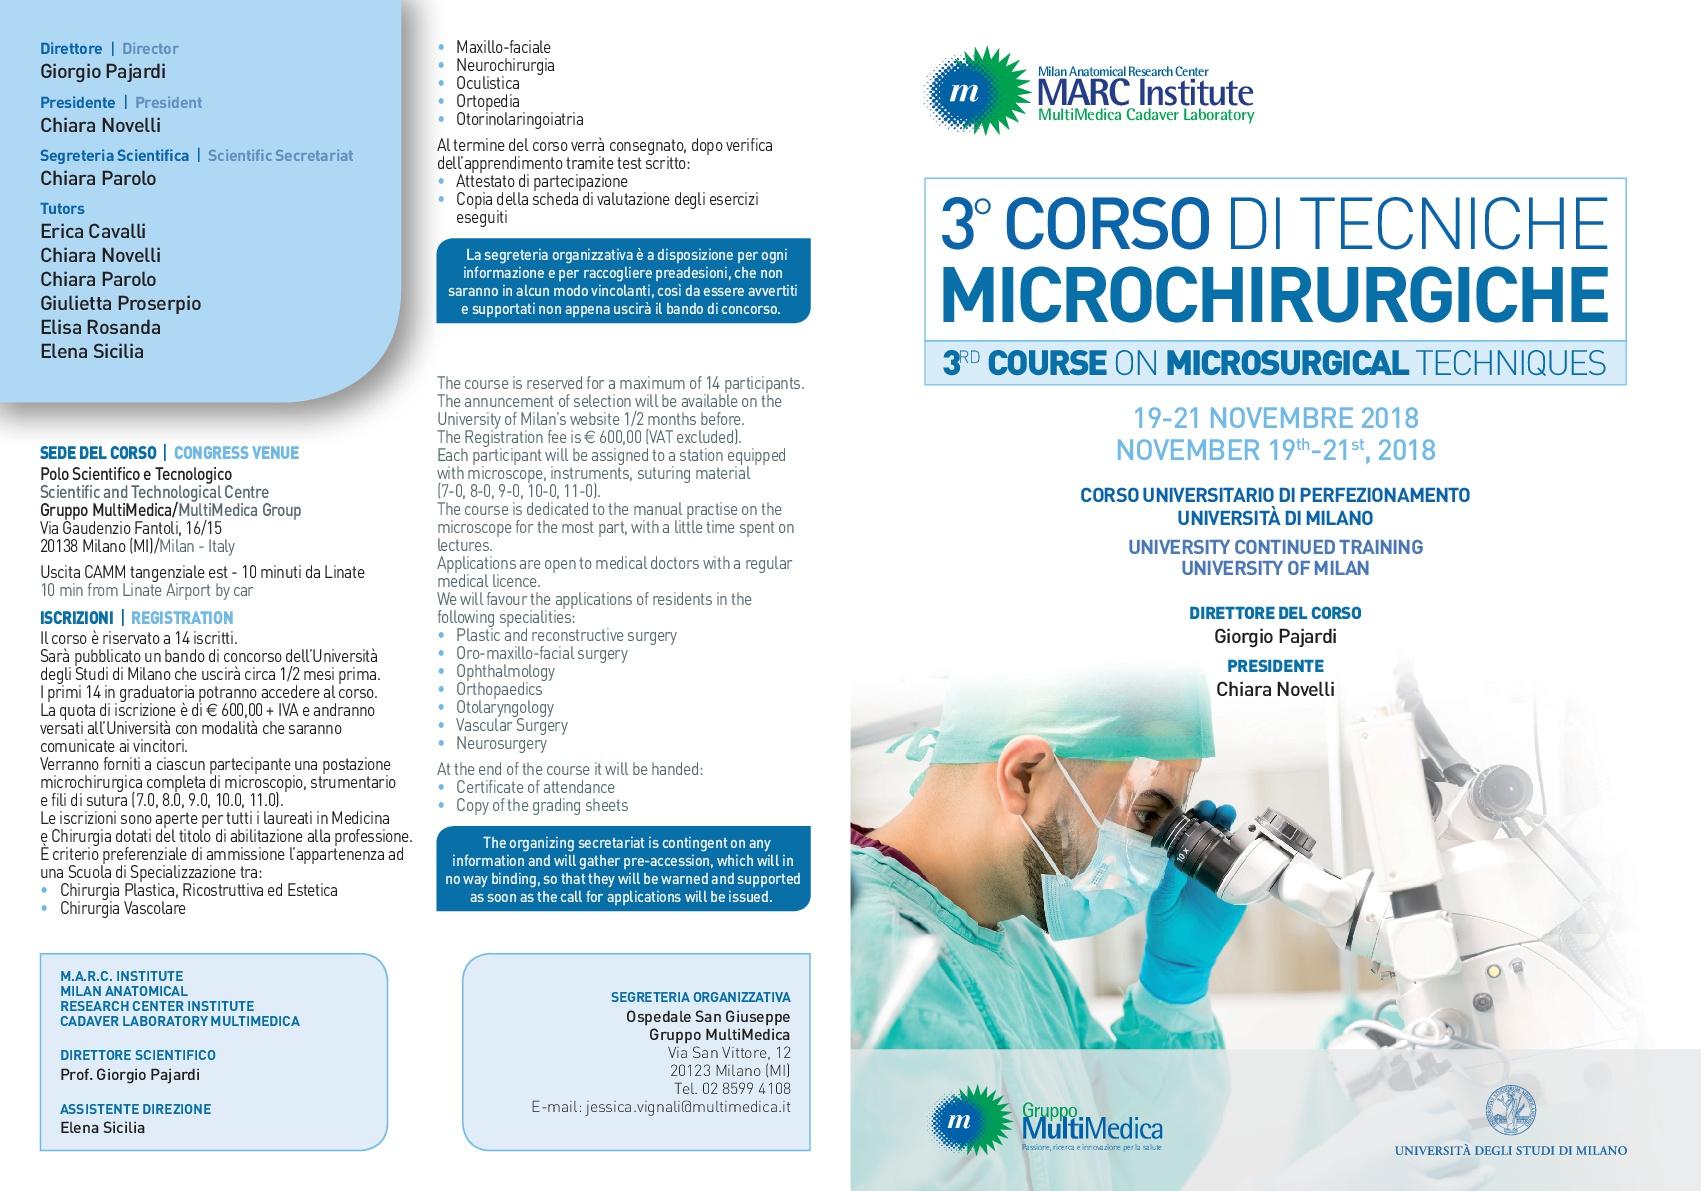 Microchirurgia_MI_nov2018_v8-001